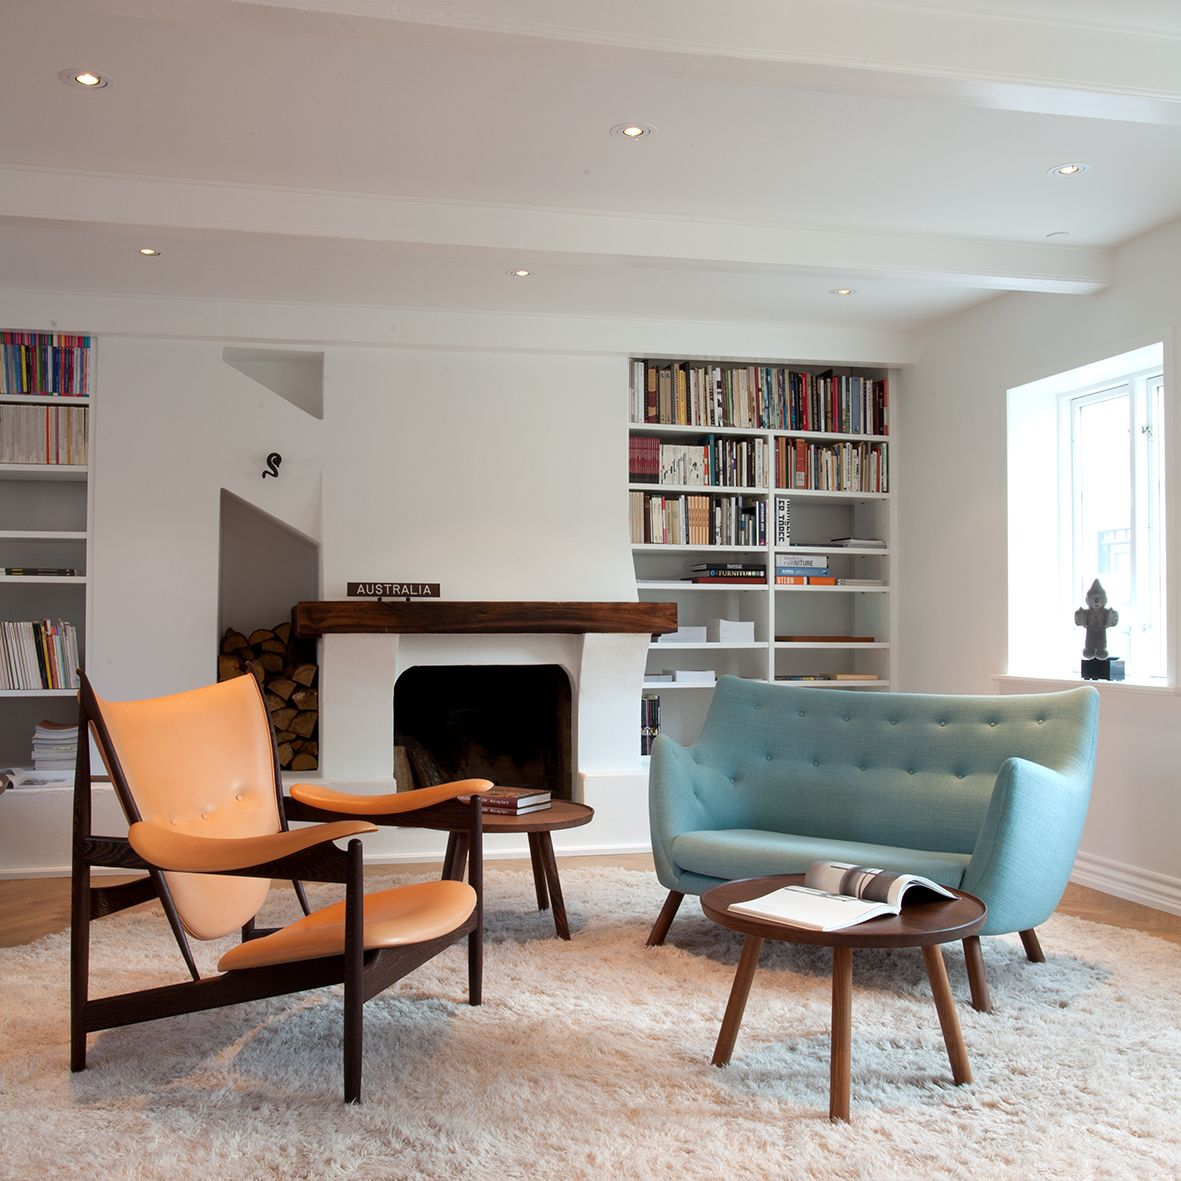 Finn juhl the baker sofa - Chieftain Chair Poet Sofa And Pelican Tables By House Of Finn Juhl